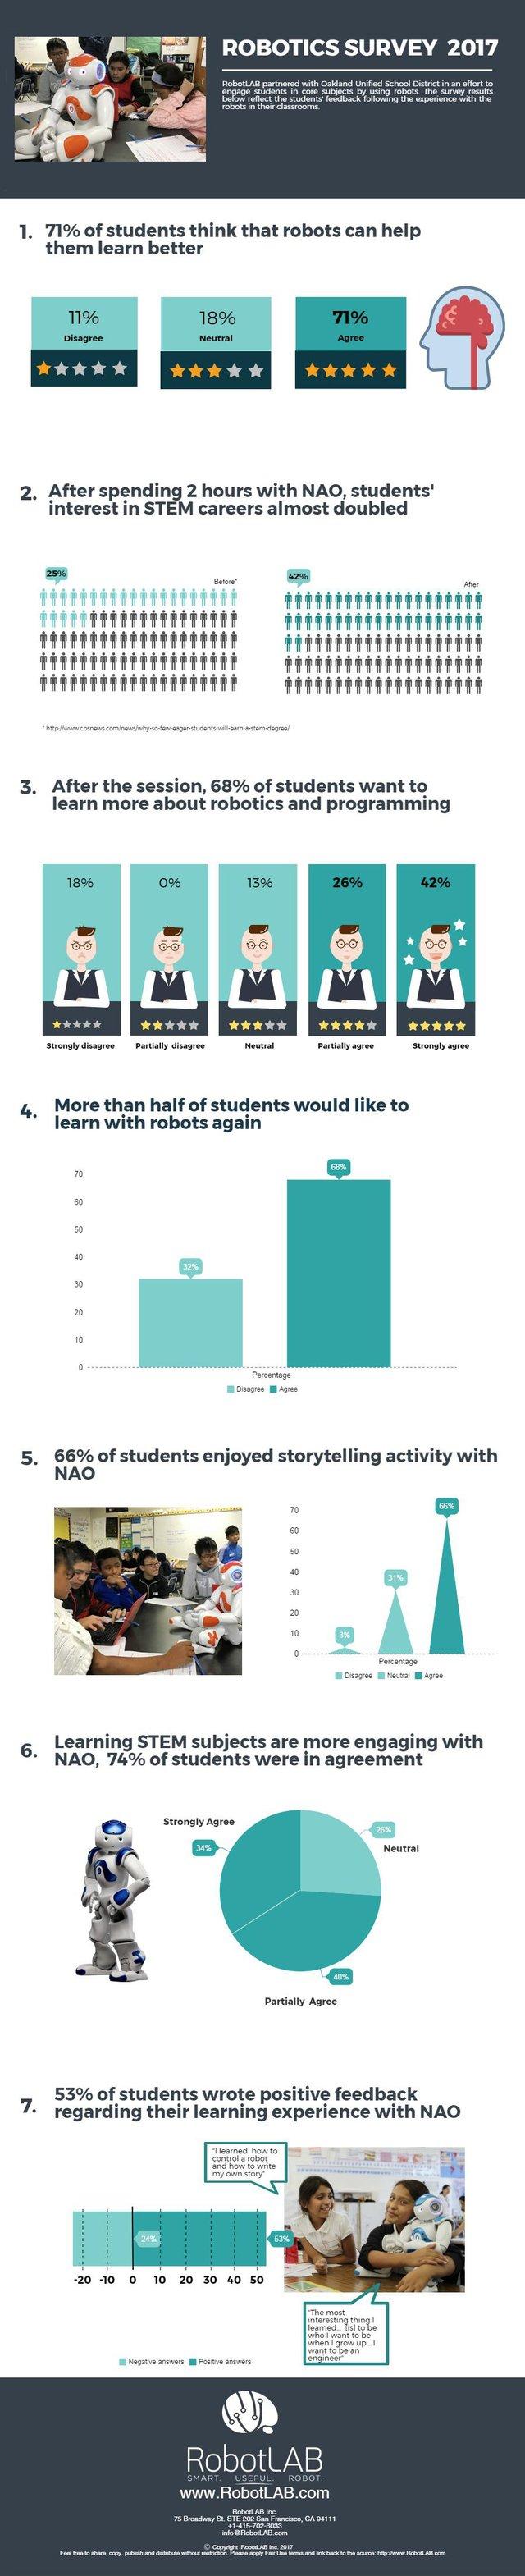 EdTech, STEM, Robotics and Math Education   RobotsLAB Blog